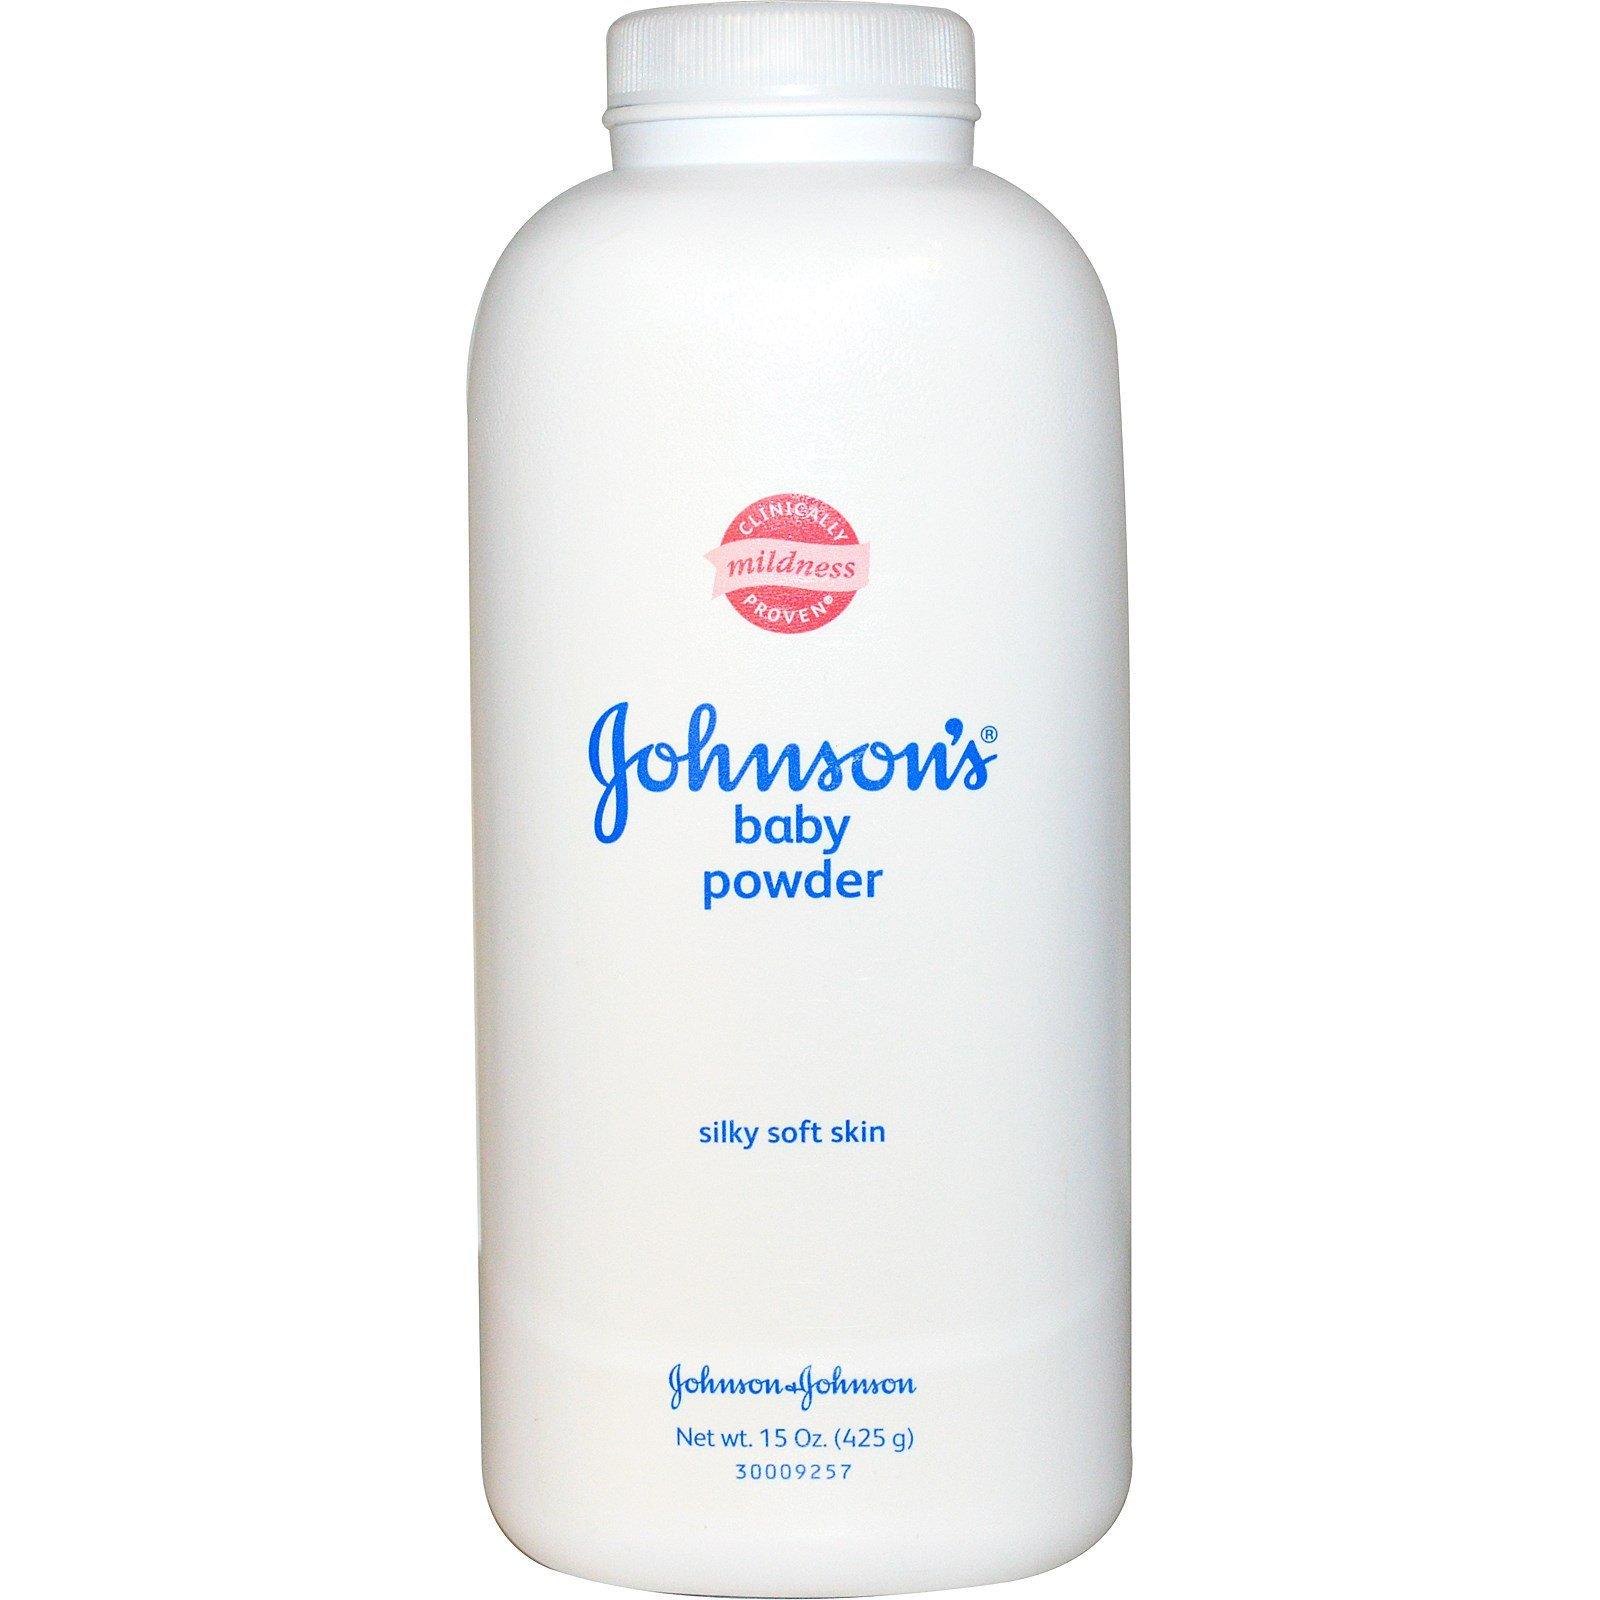 Johnson & Johnson Baby Powder, Helps Eliminate Friction, 15oz by J & J